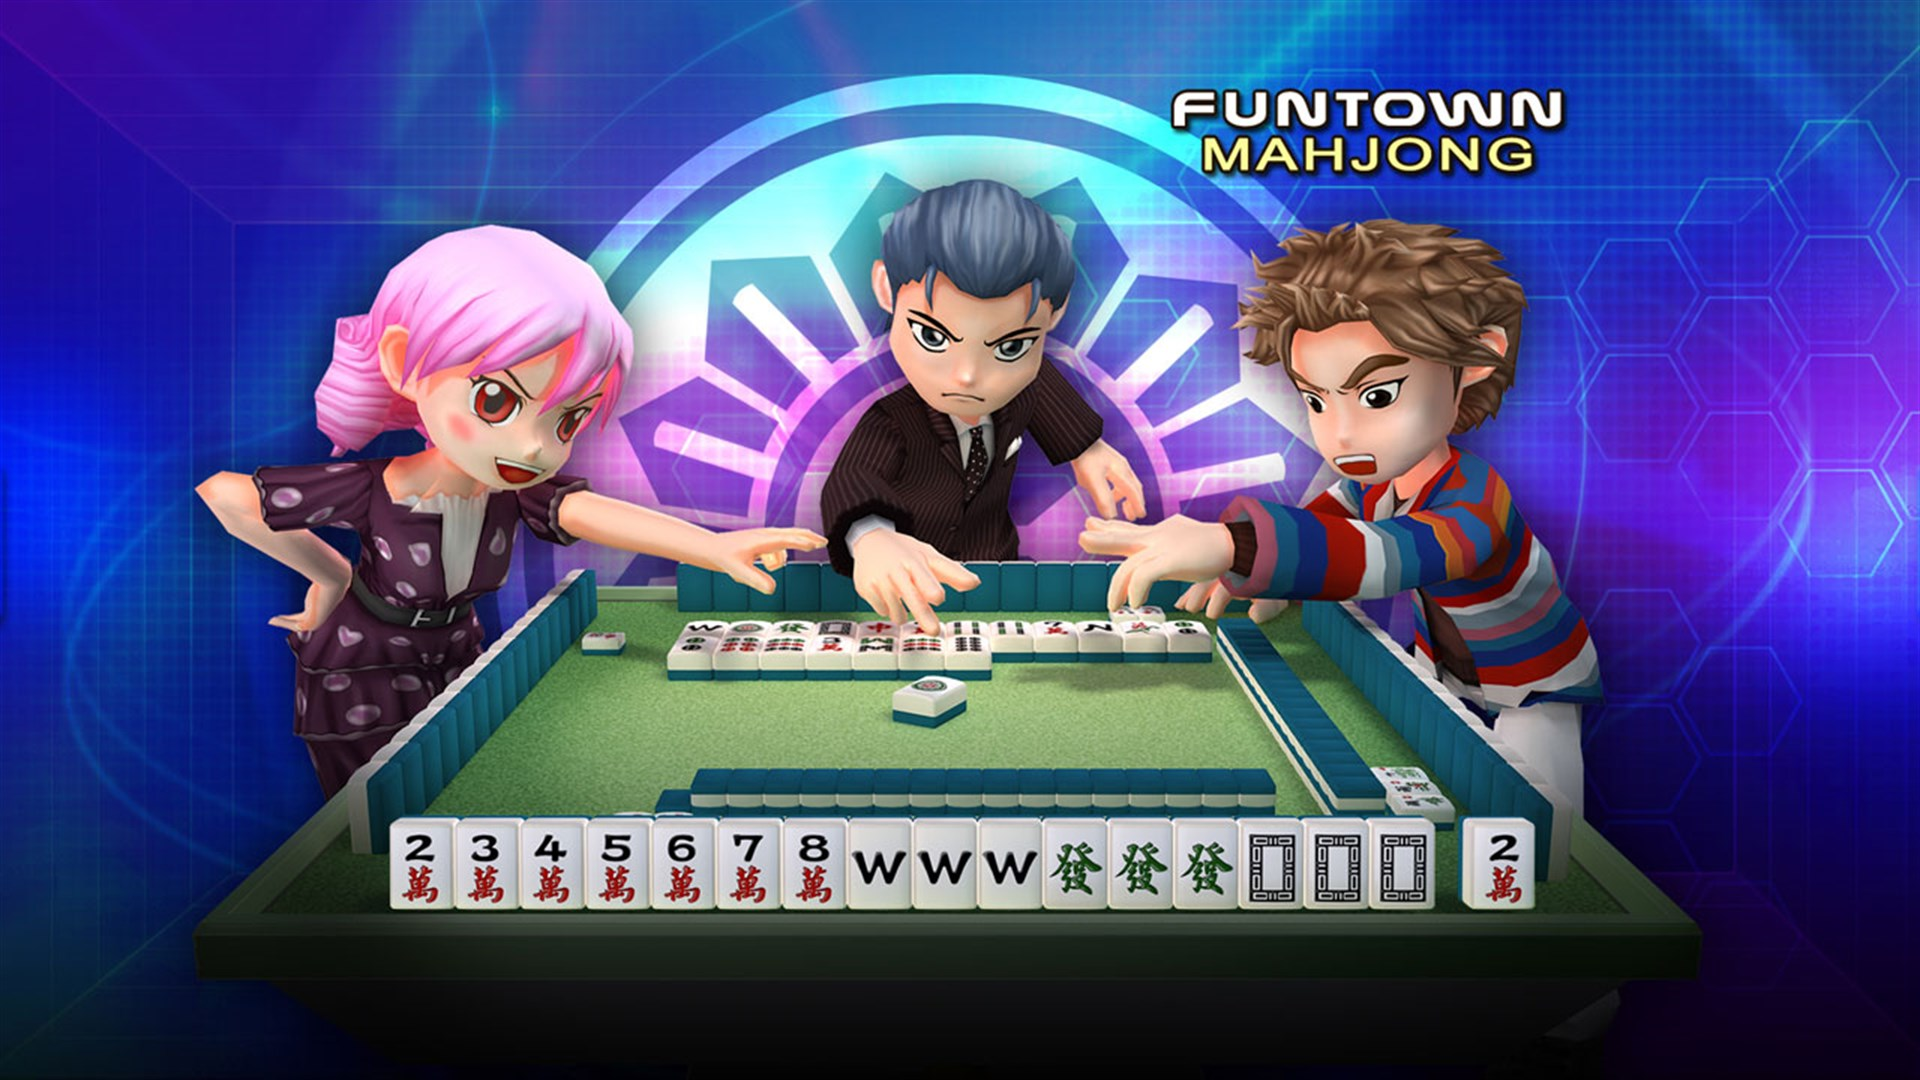 FunTown Mahjong - Chinese Festival